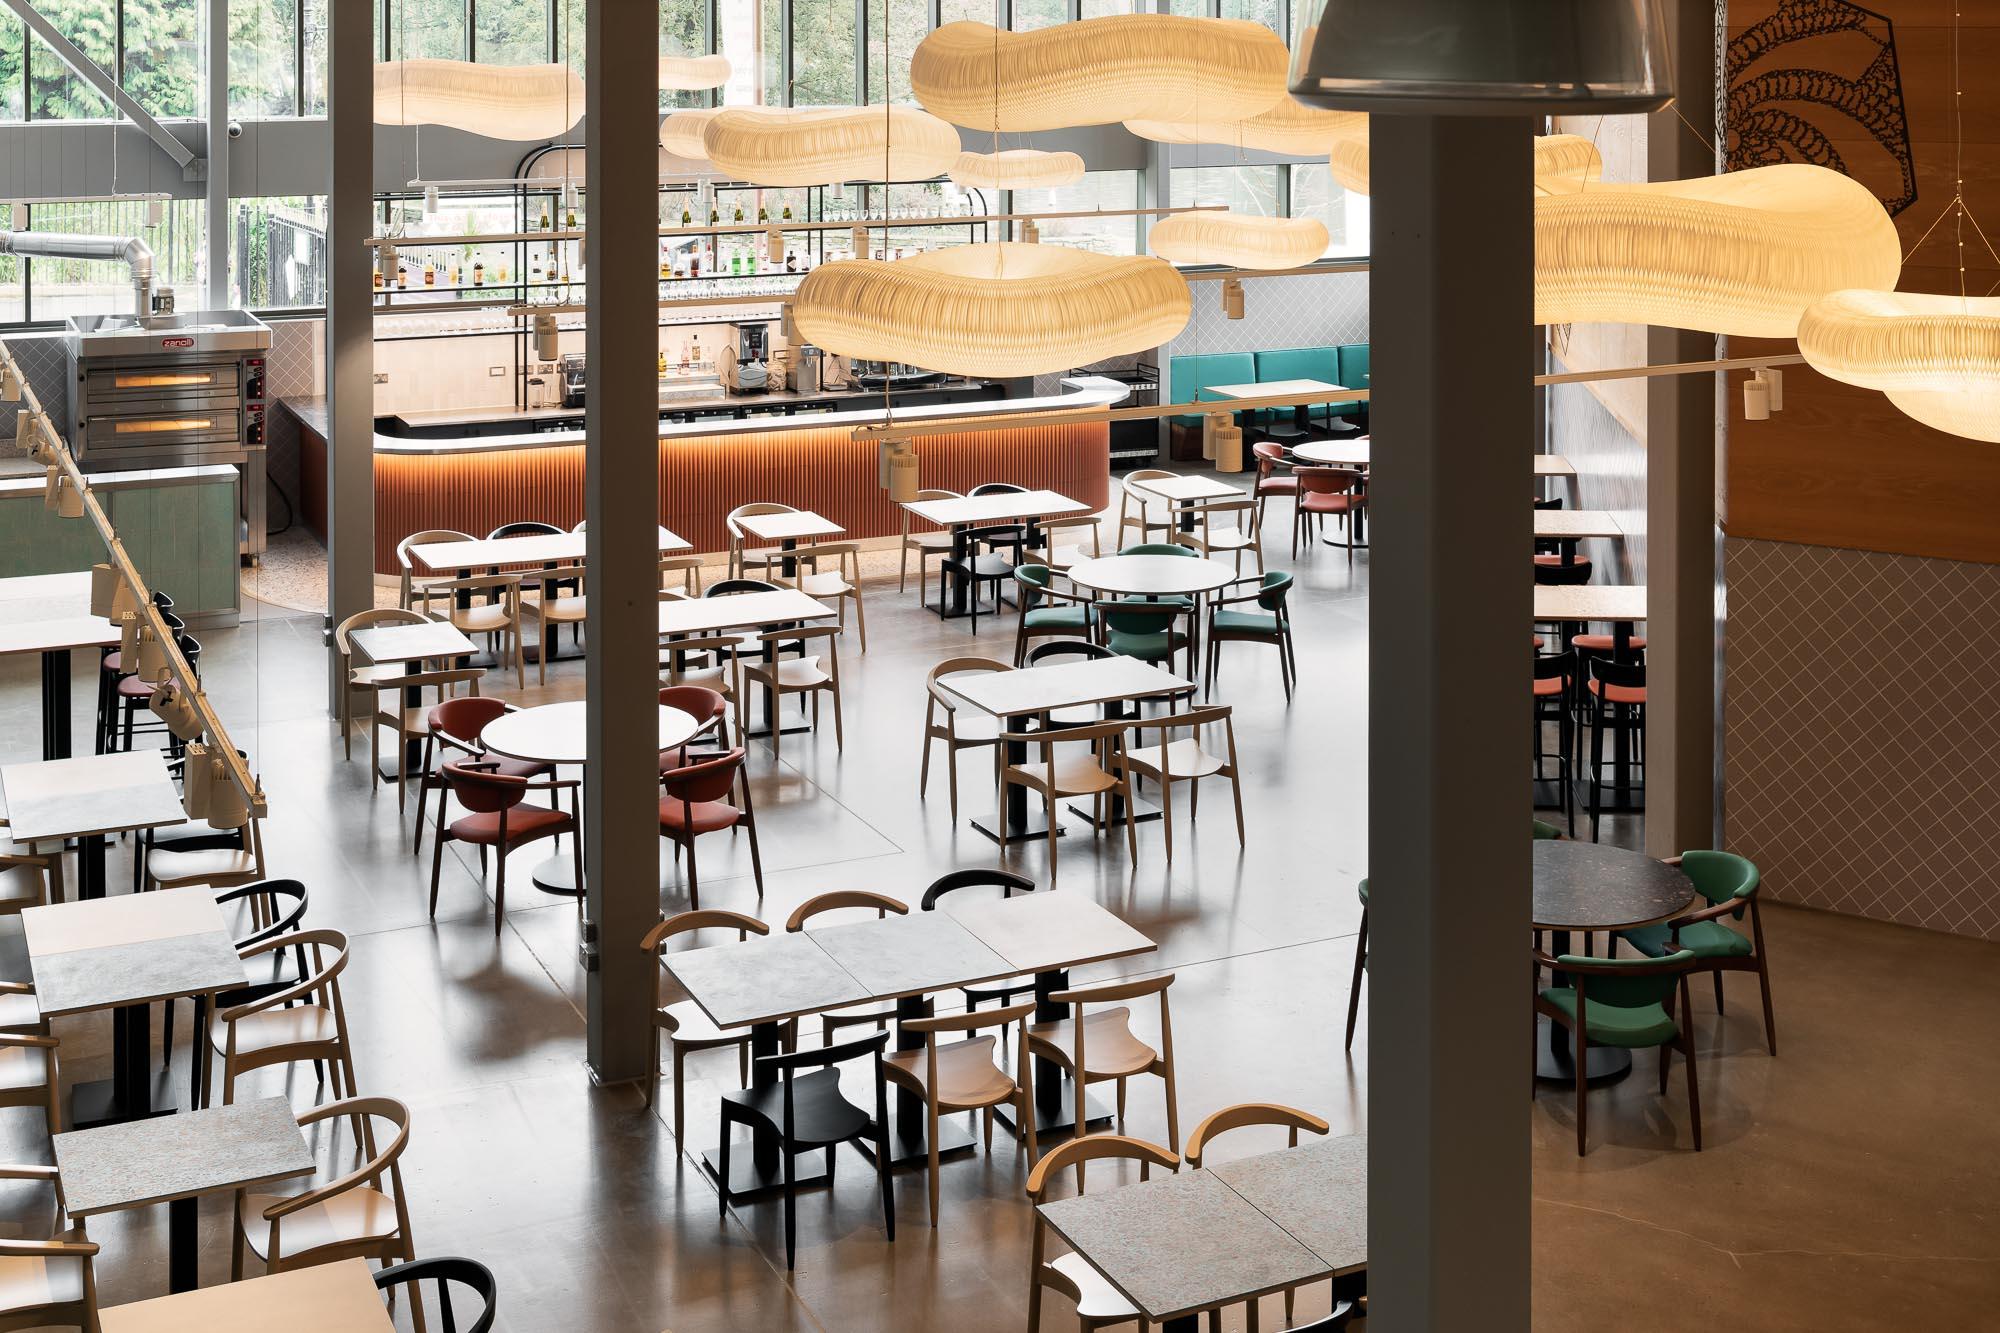 New Café and Restaurant: KILN